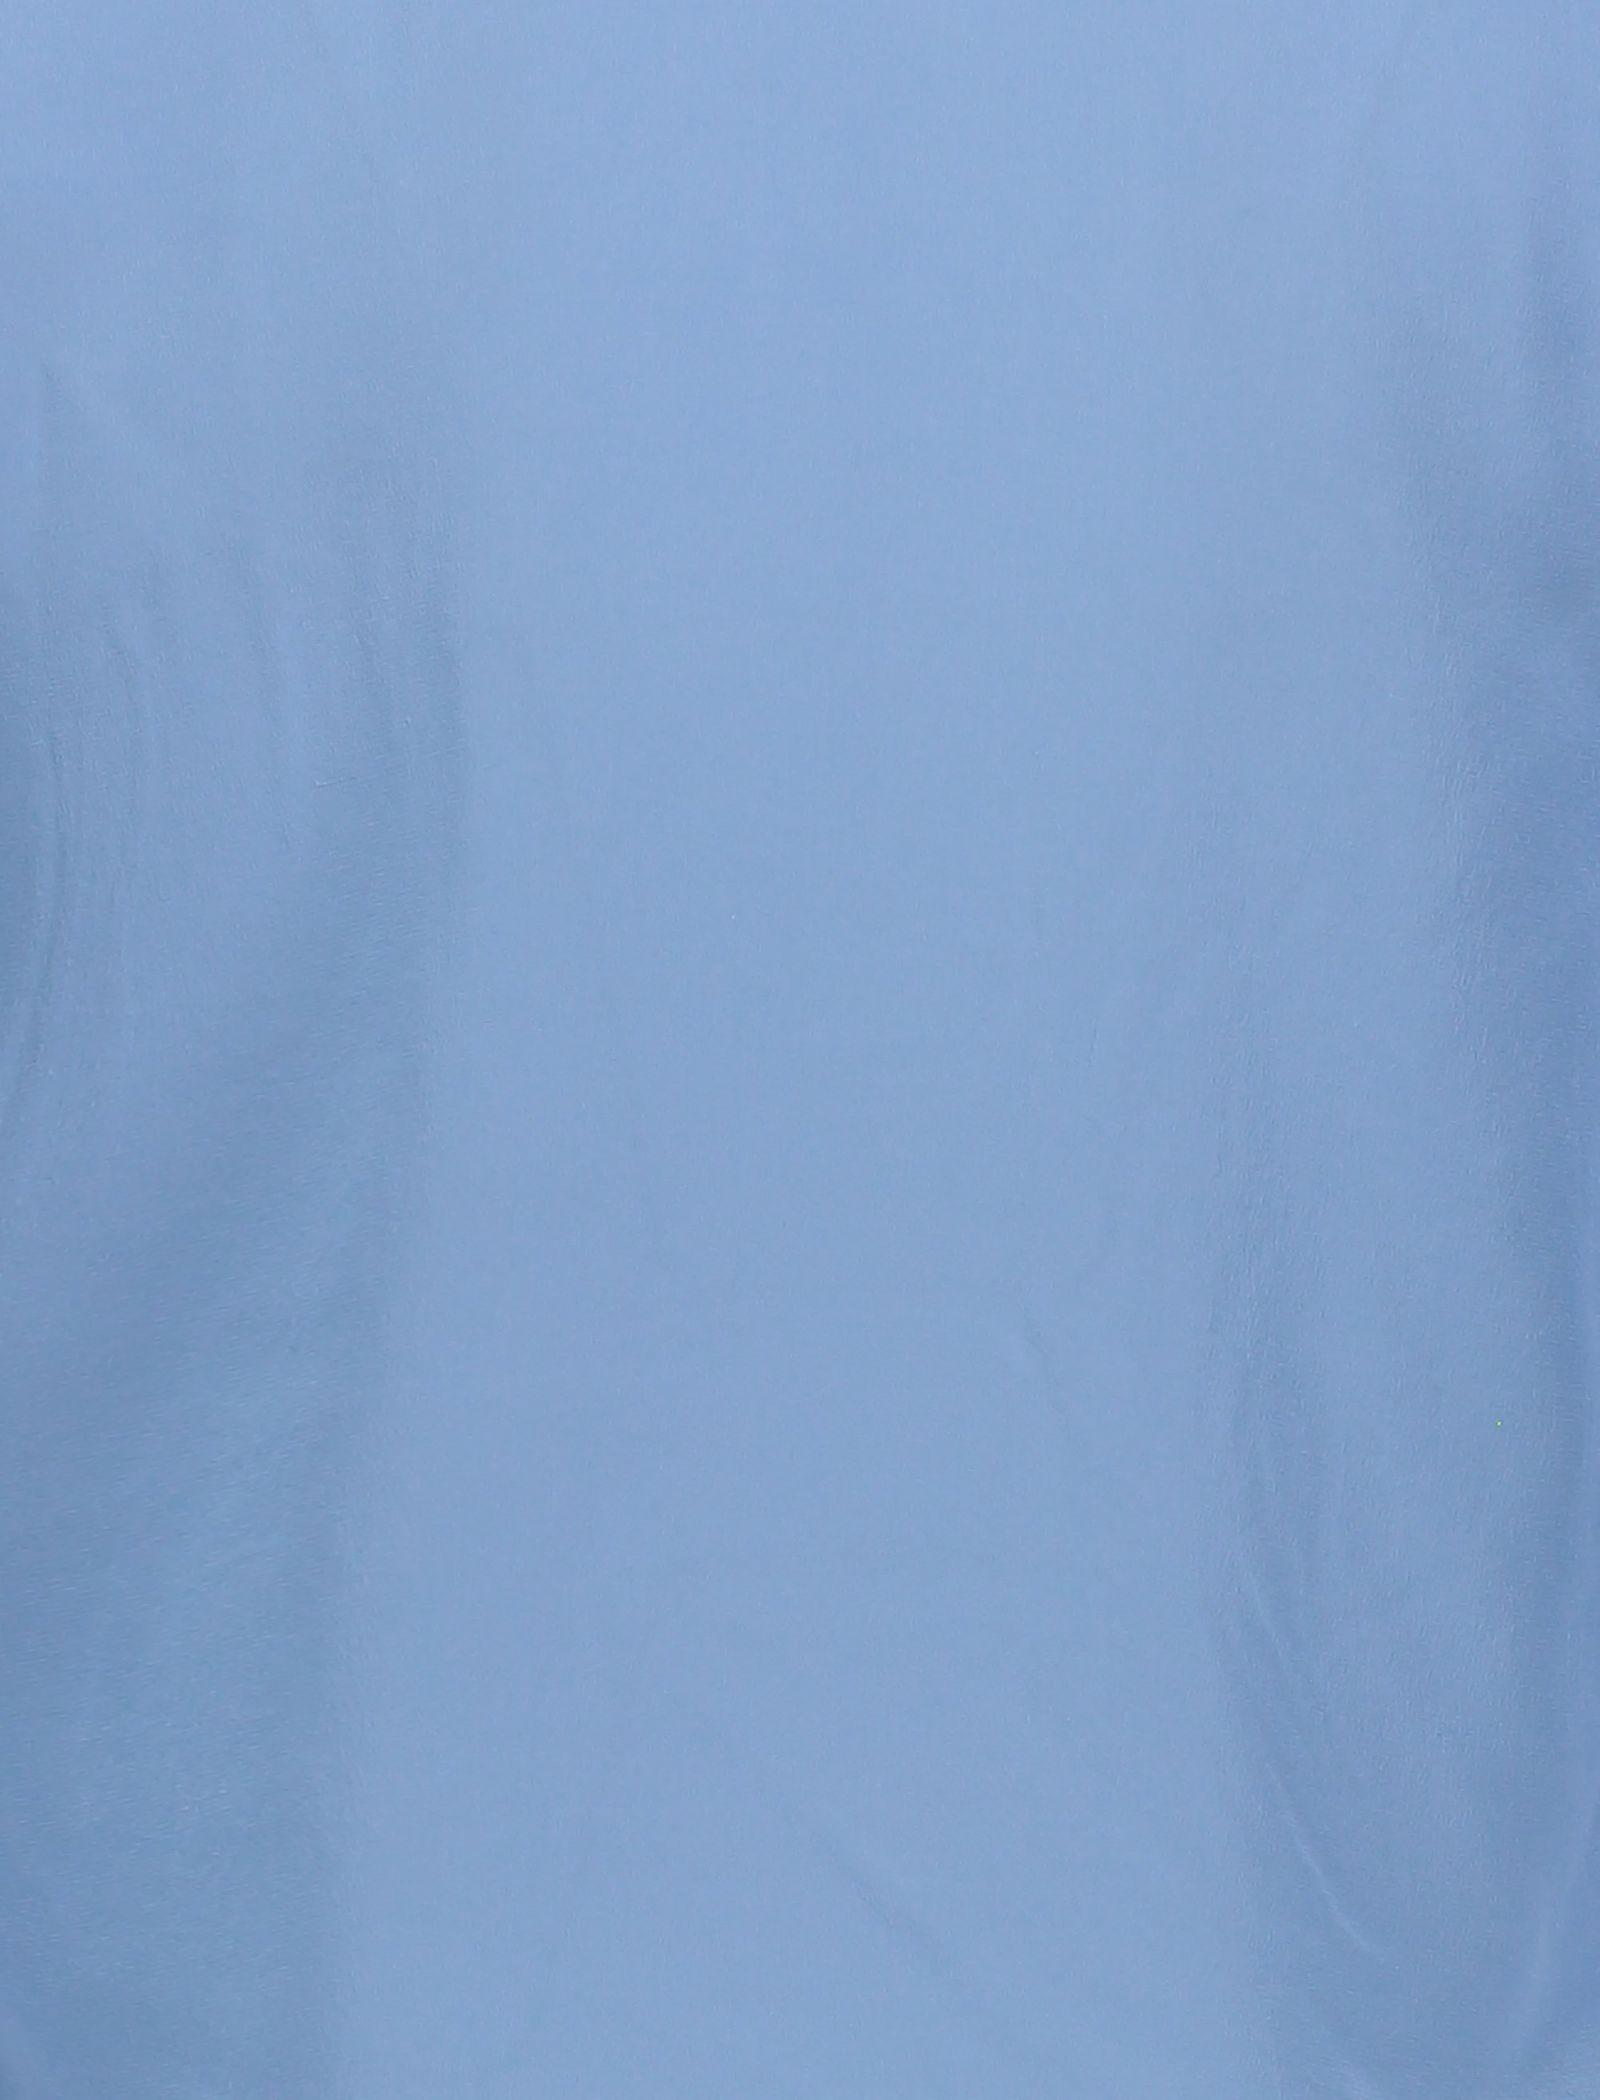 شومیز ابریشم آستین بلند زنانه - مینیموم - آبي - 5